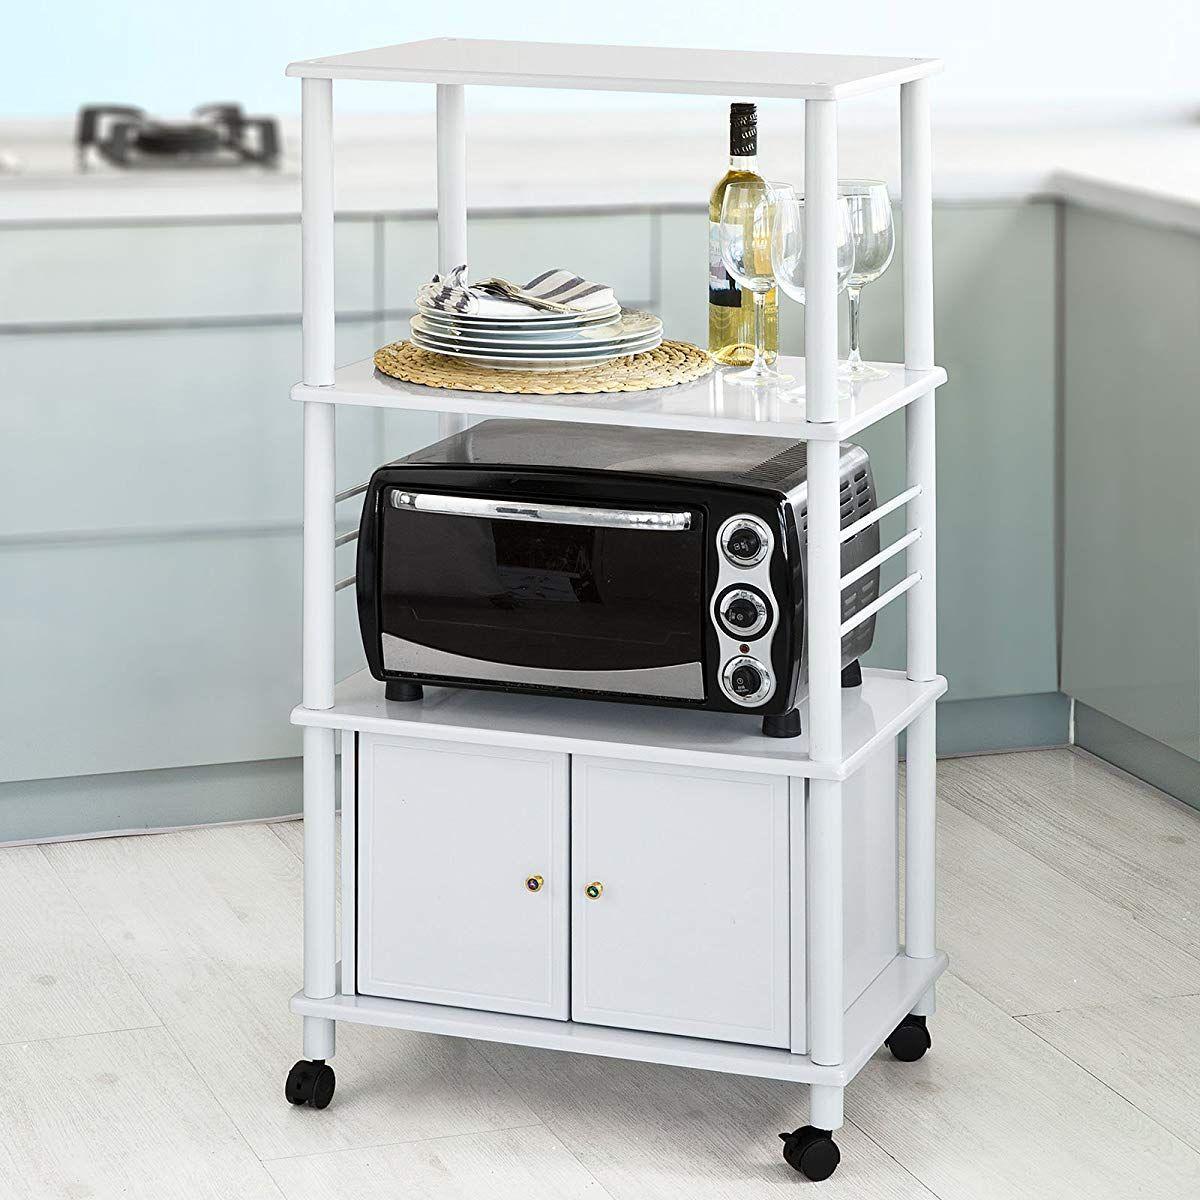 microwave shelf mini shelf kitchen